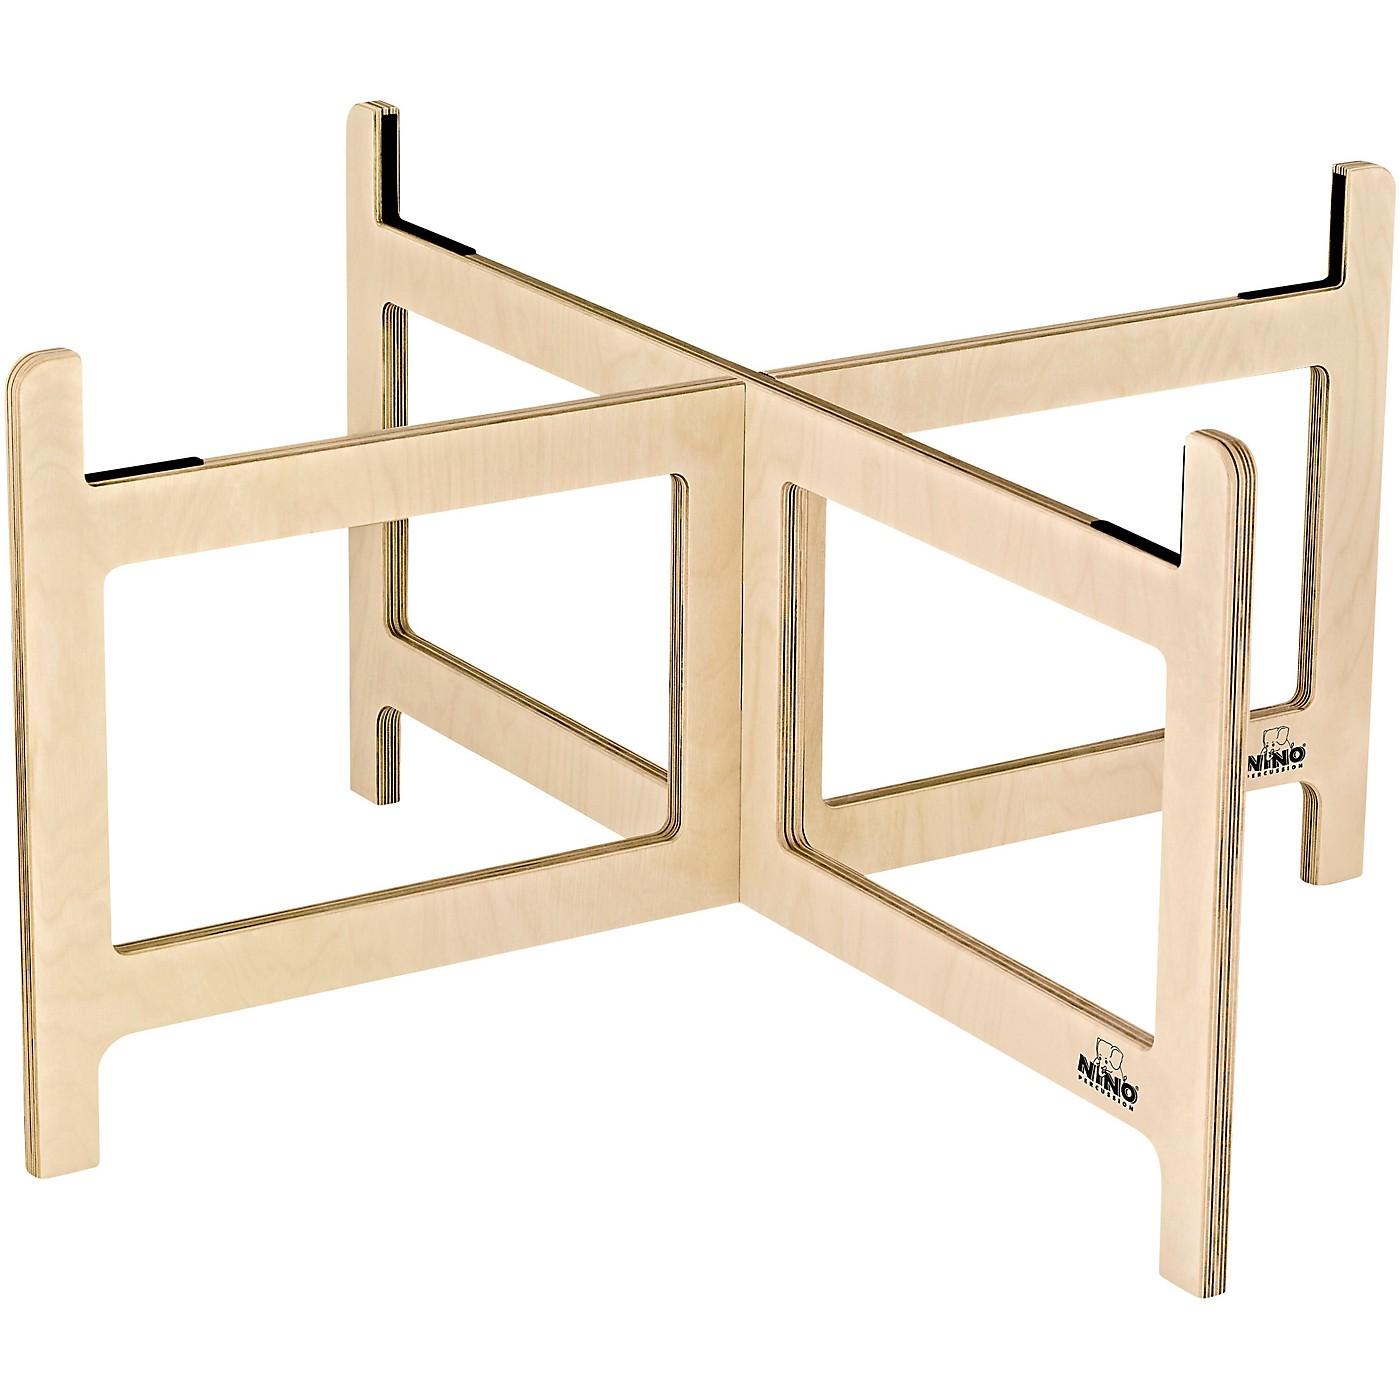 Nino Wooden Classroom Cajon Stand for NINO954 thumbnail